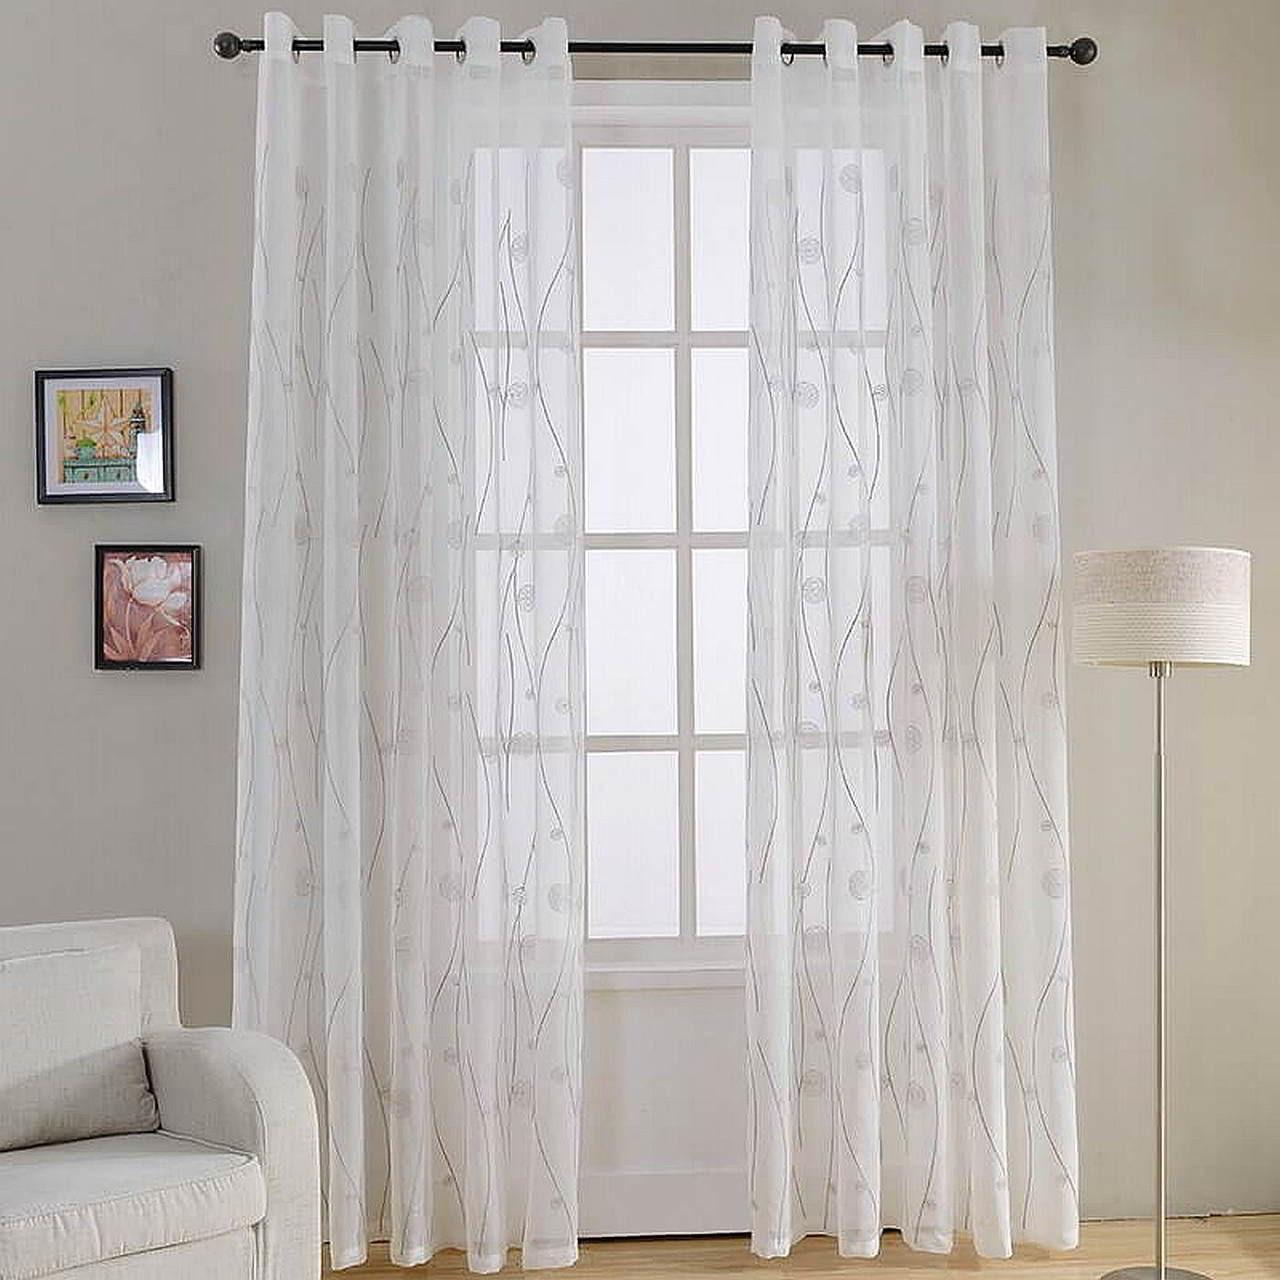 Sheer Curtain Panels - Naples - DMC488 Dolce Mela